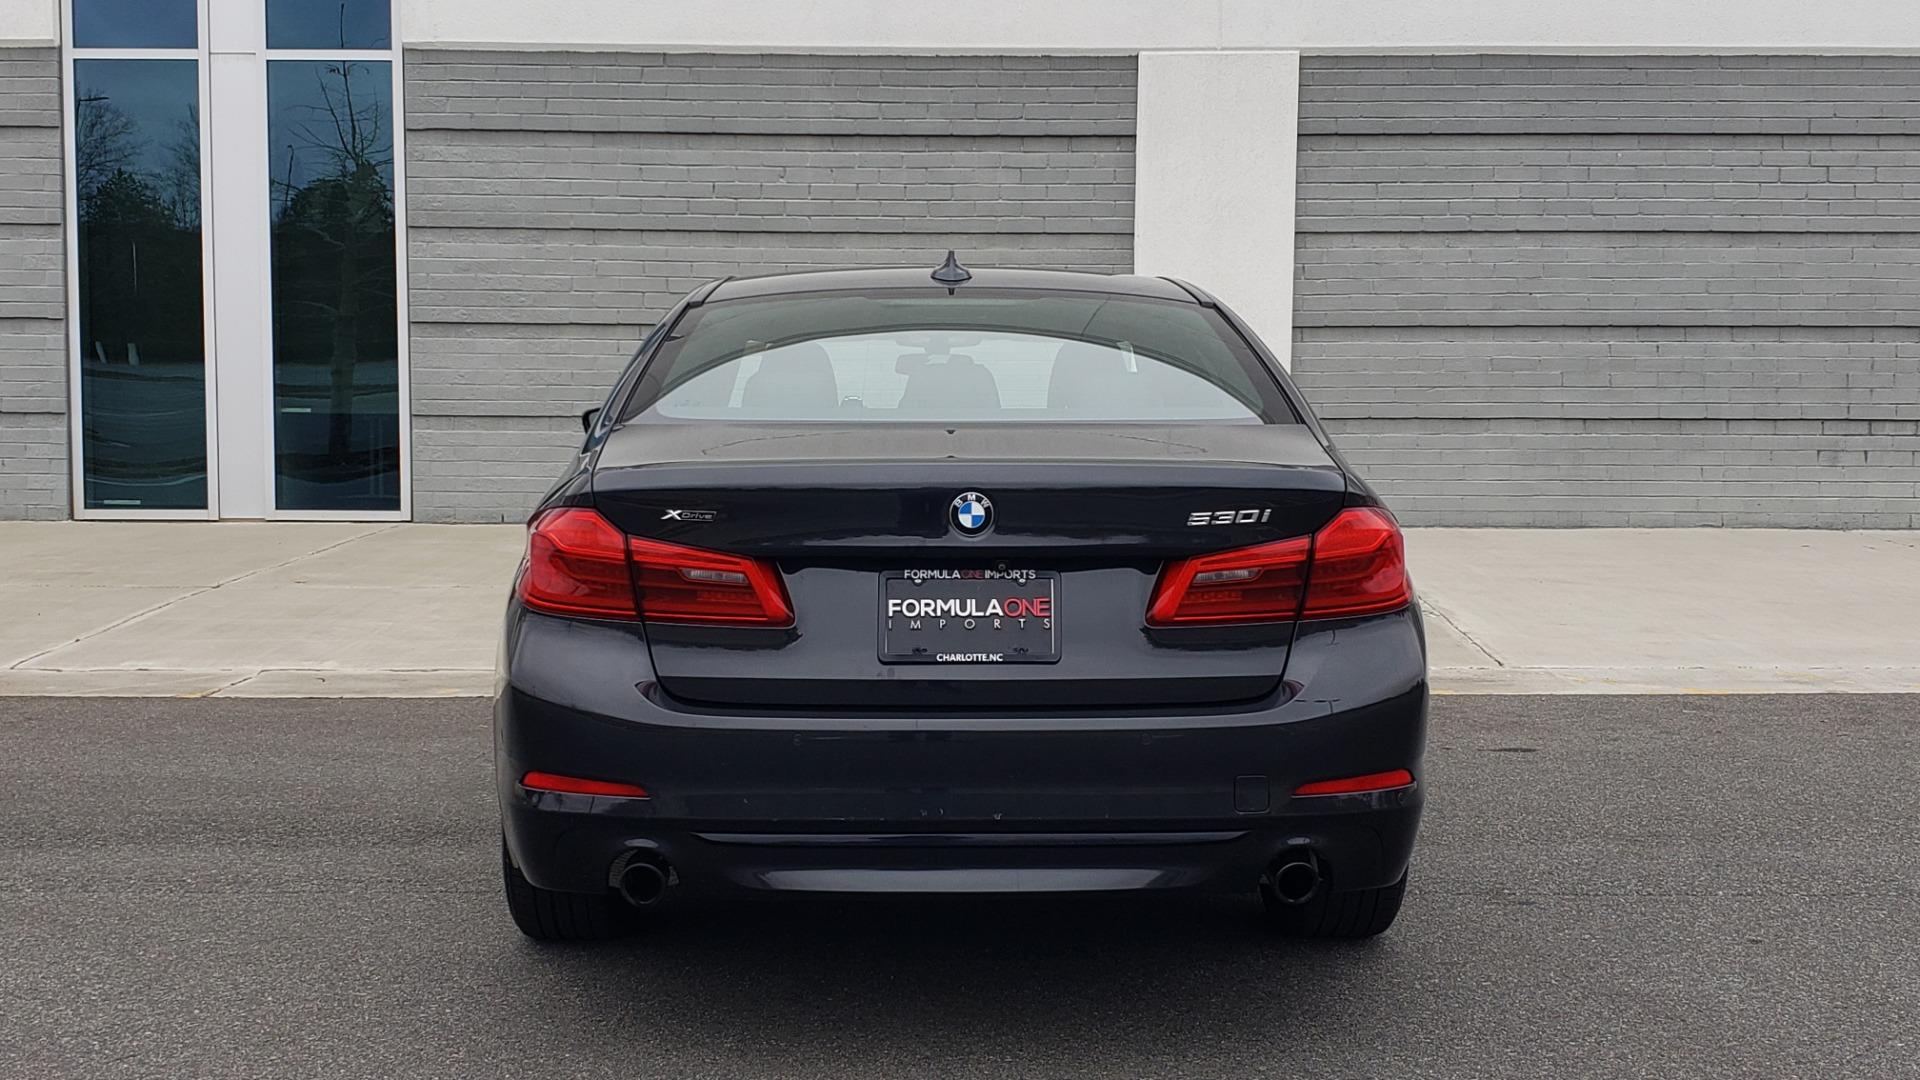 Used 2017 BMW 5 SERIES 530IXDRIVE / PREM PKG / DRVR ASST PLUS / CLD WTHR / APPLE CARPLAY for sale Sold at Formula Imports in Charlotte NC 28227 25